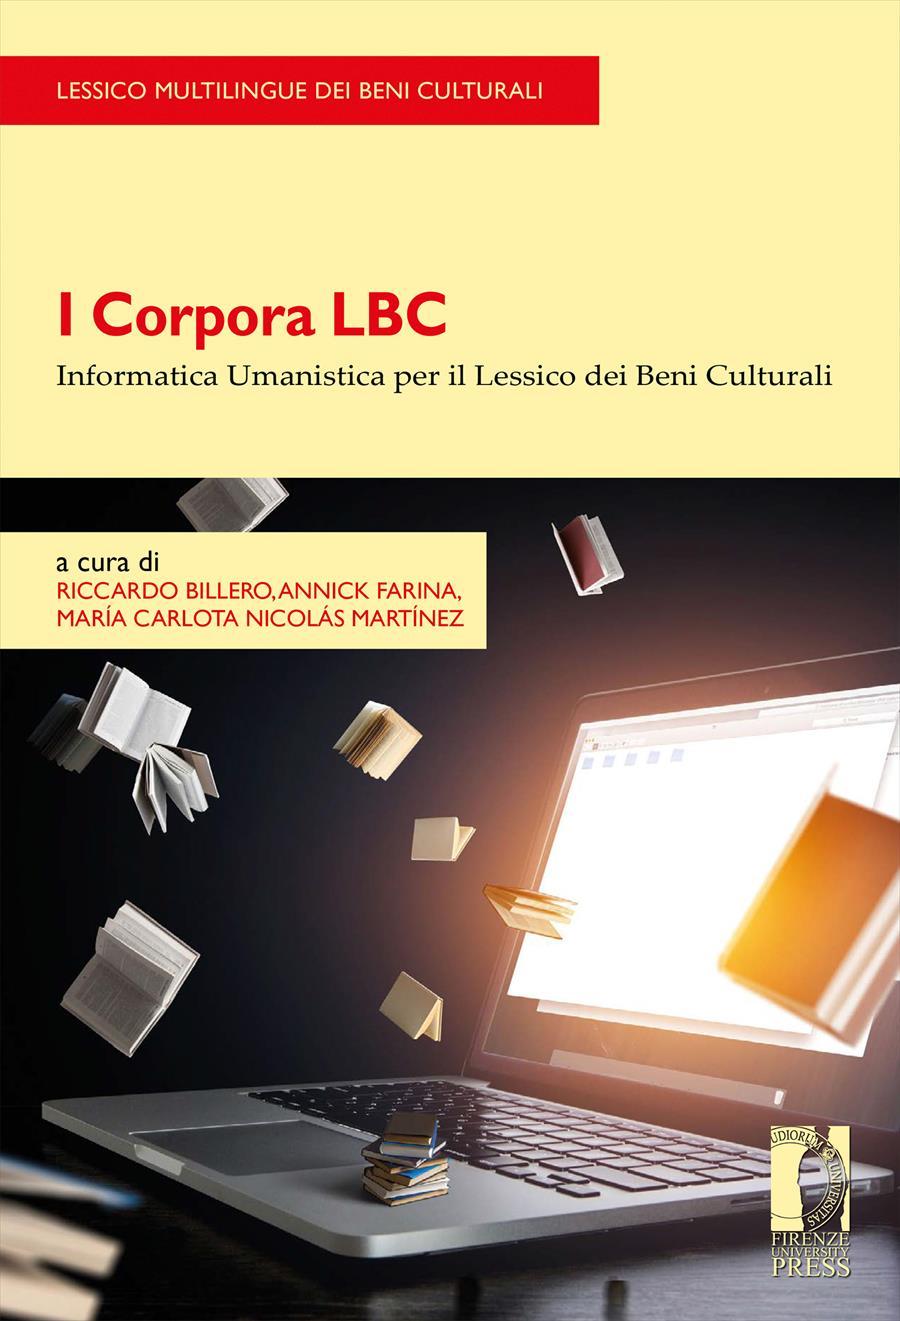 I Corpora LBC